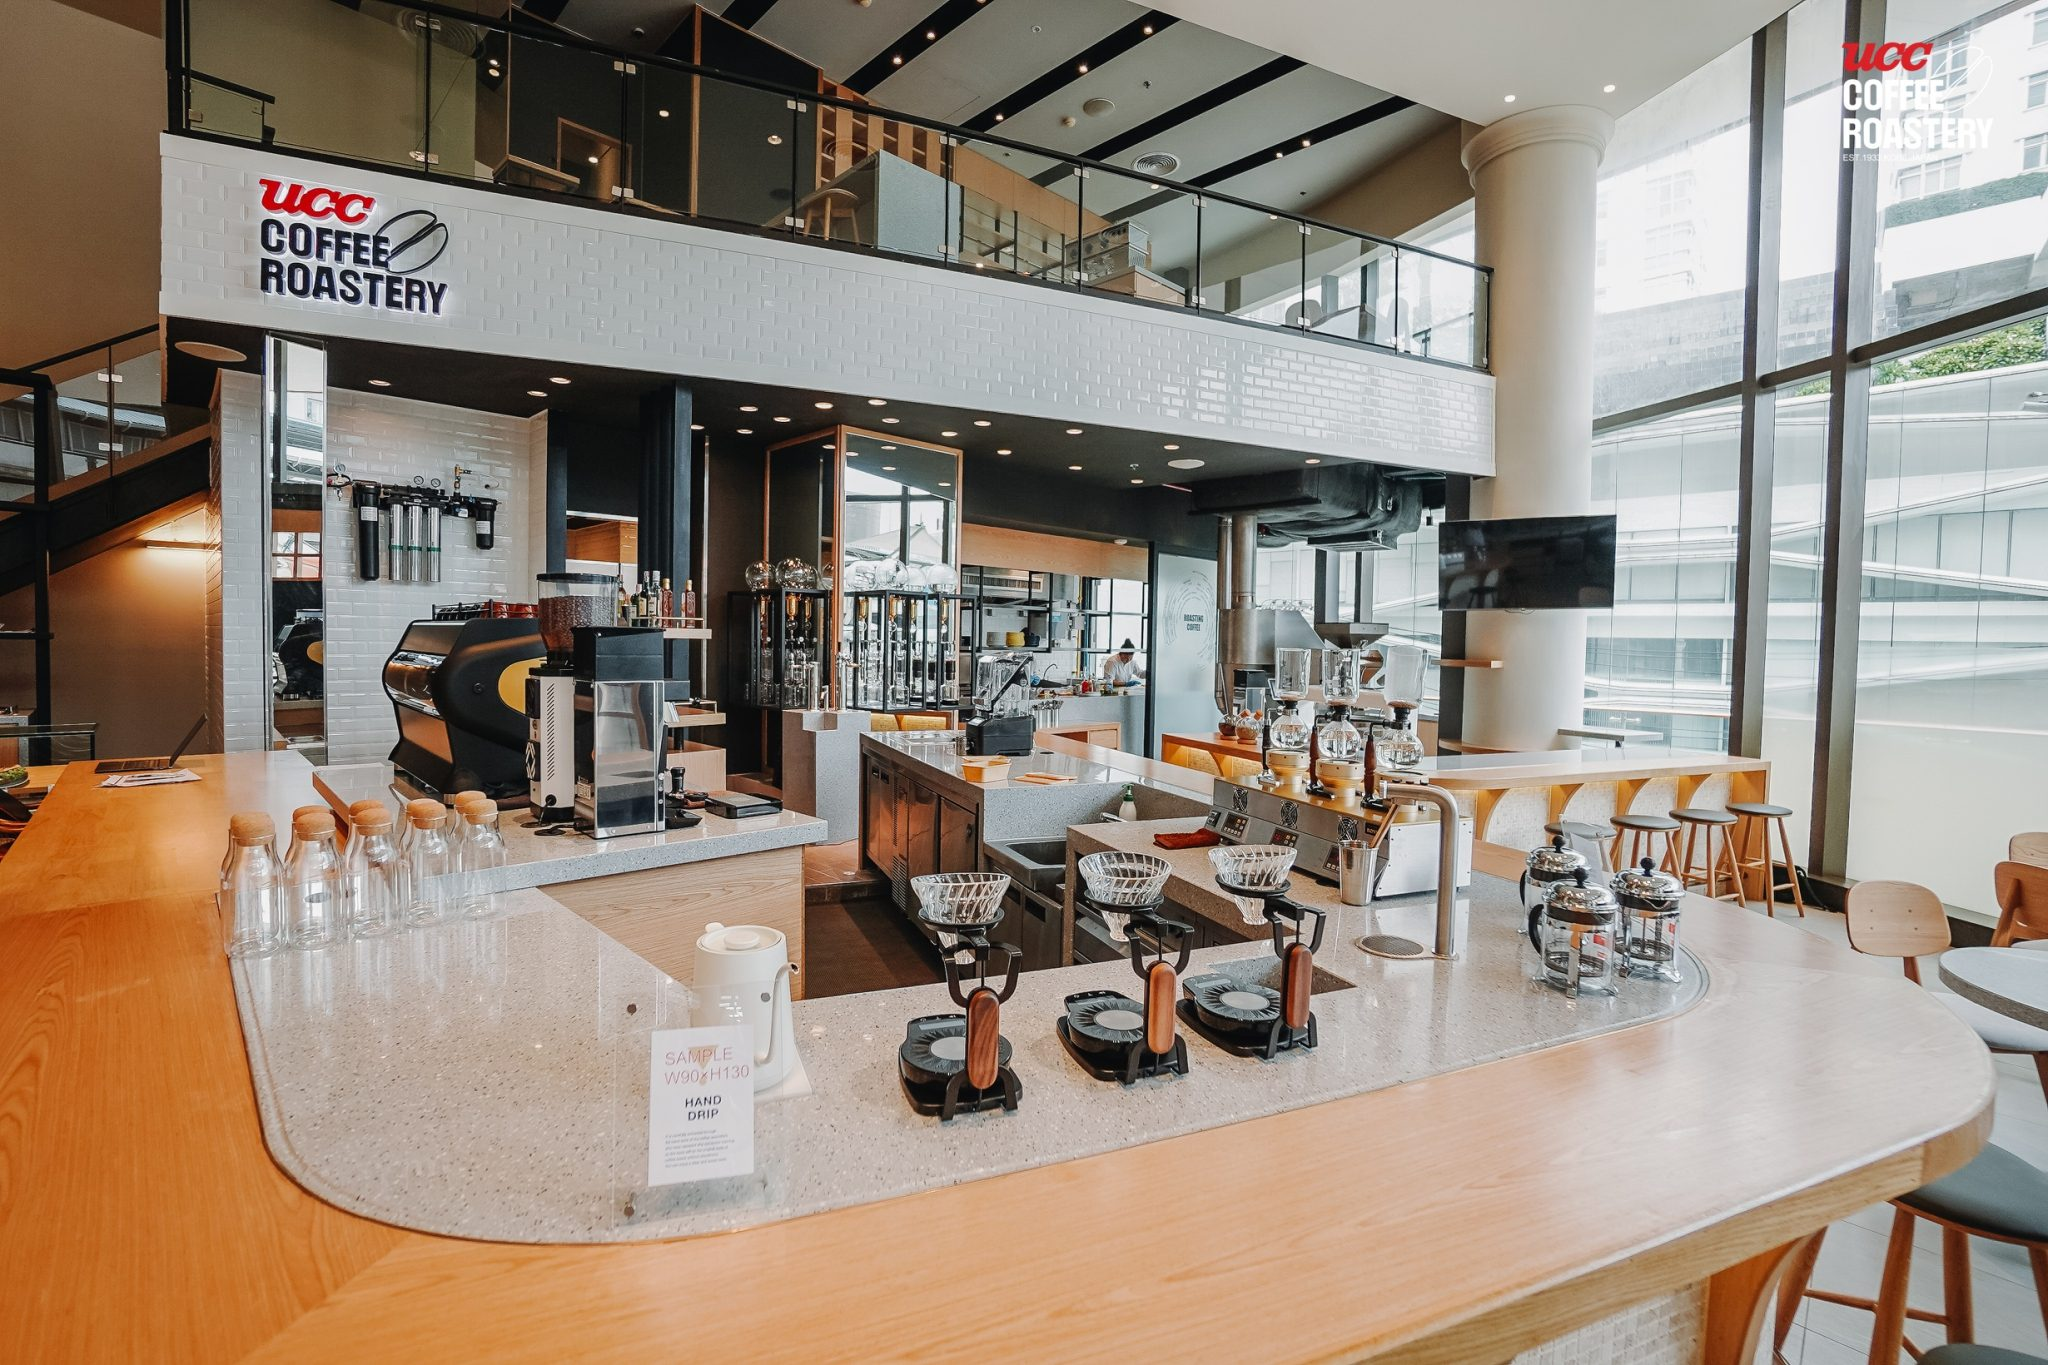 """UCC Coffee Roastery"" ร้านกาแฟ UCC concept store แห่งแรกในเอเชียแปซิฟิก ที่ไทย"